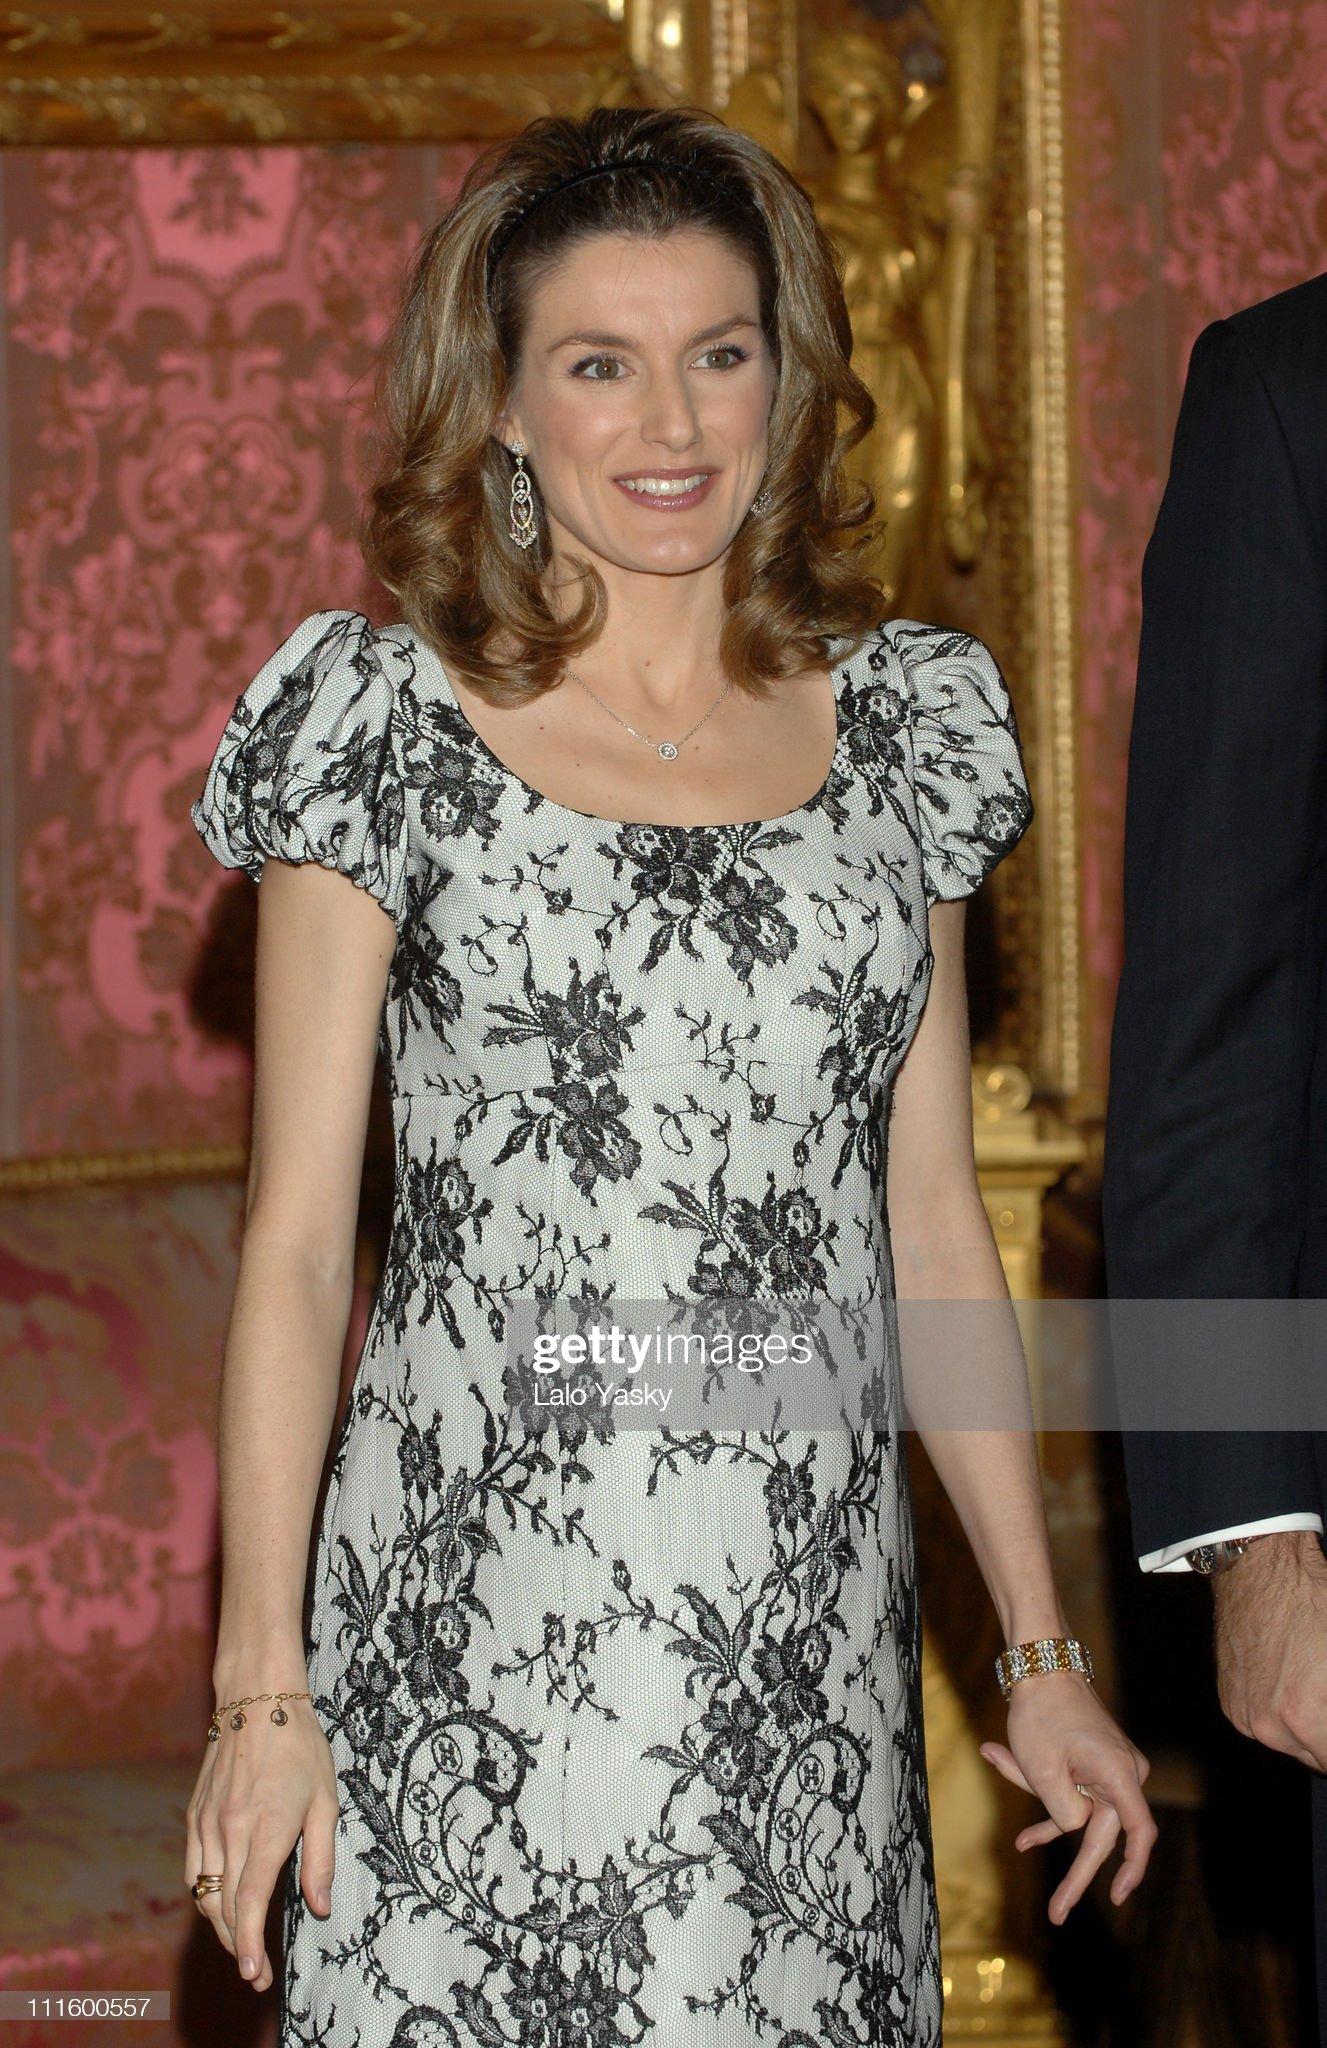 Вечерние наряды Королевы Летиции Spanish Royals Receive Mexican President - January 29, 2007 : News Photo